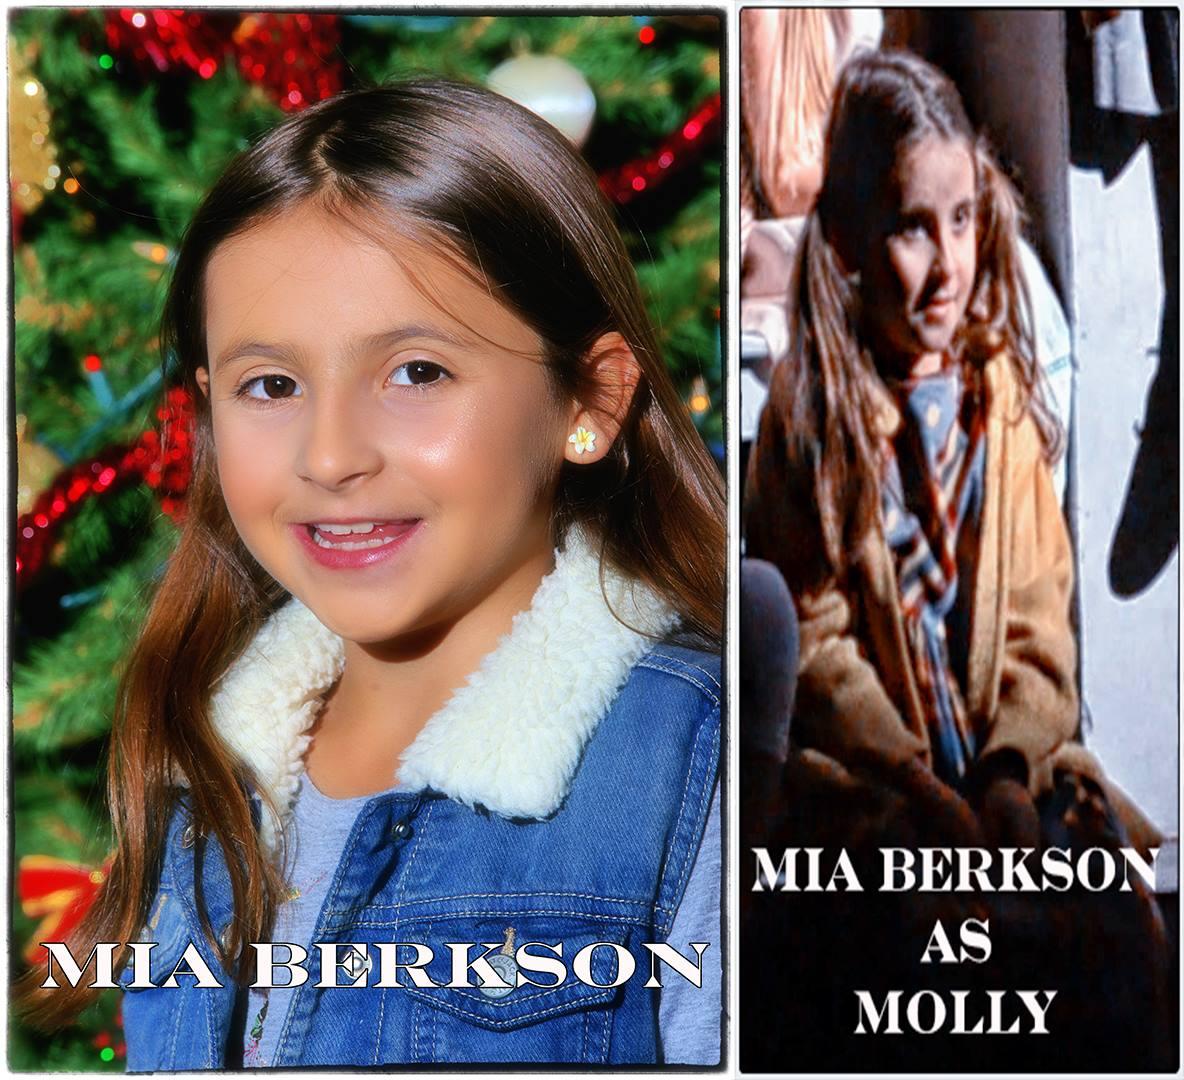 Mia Berkson